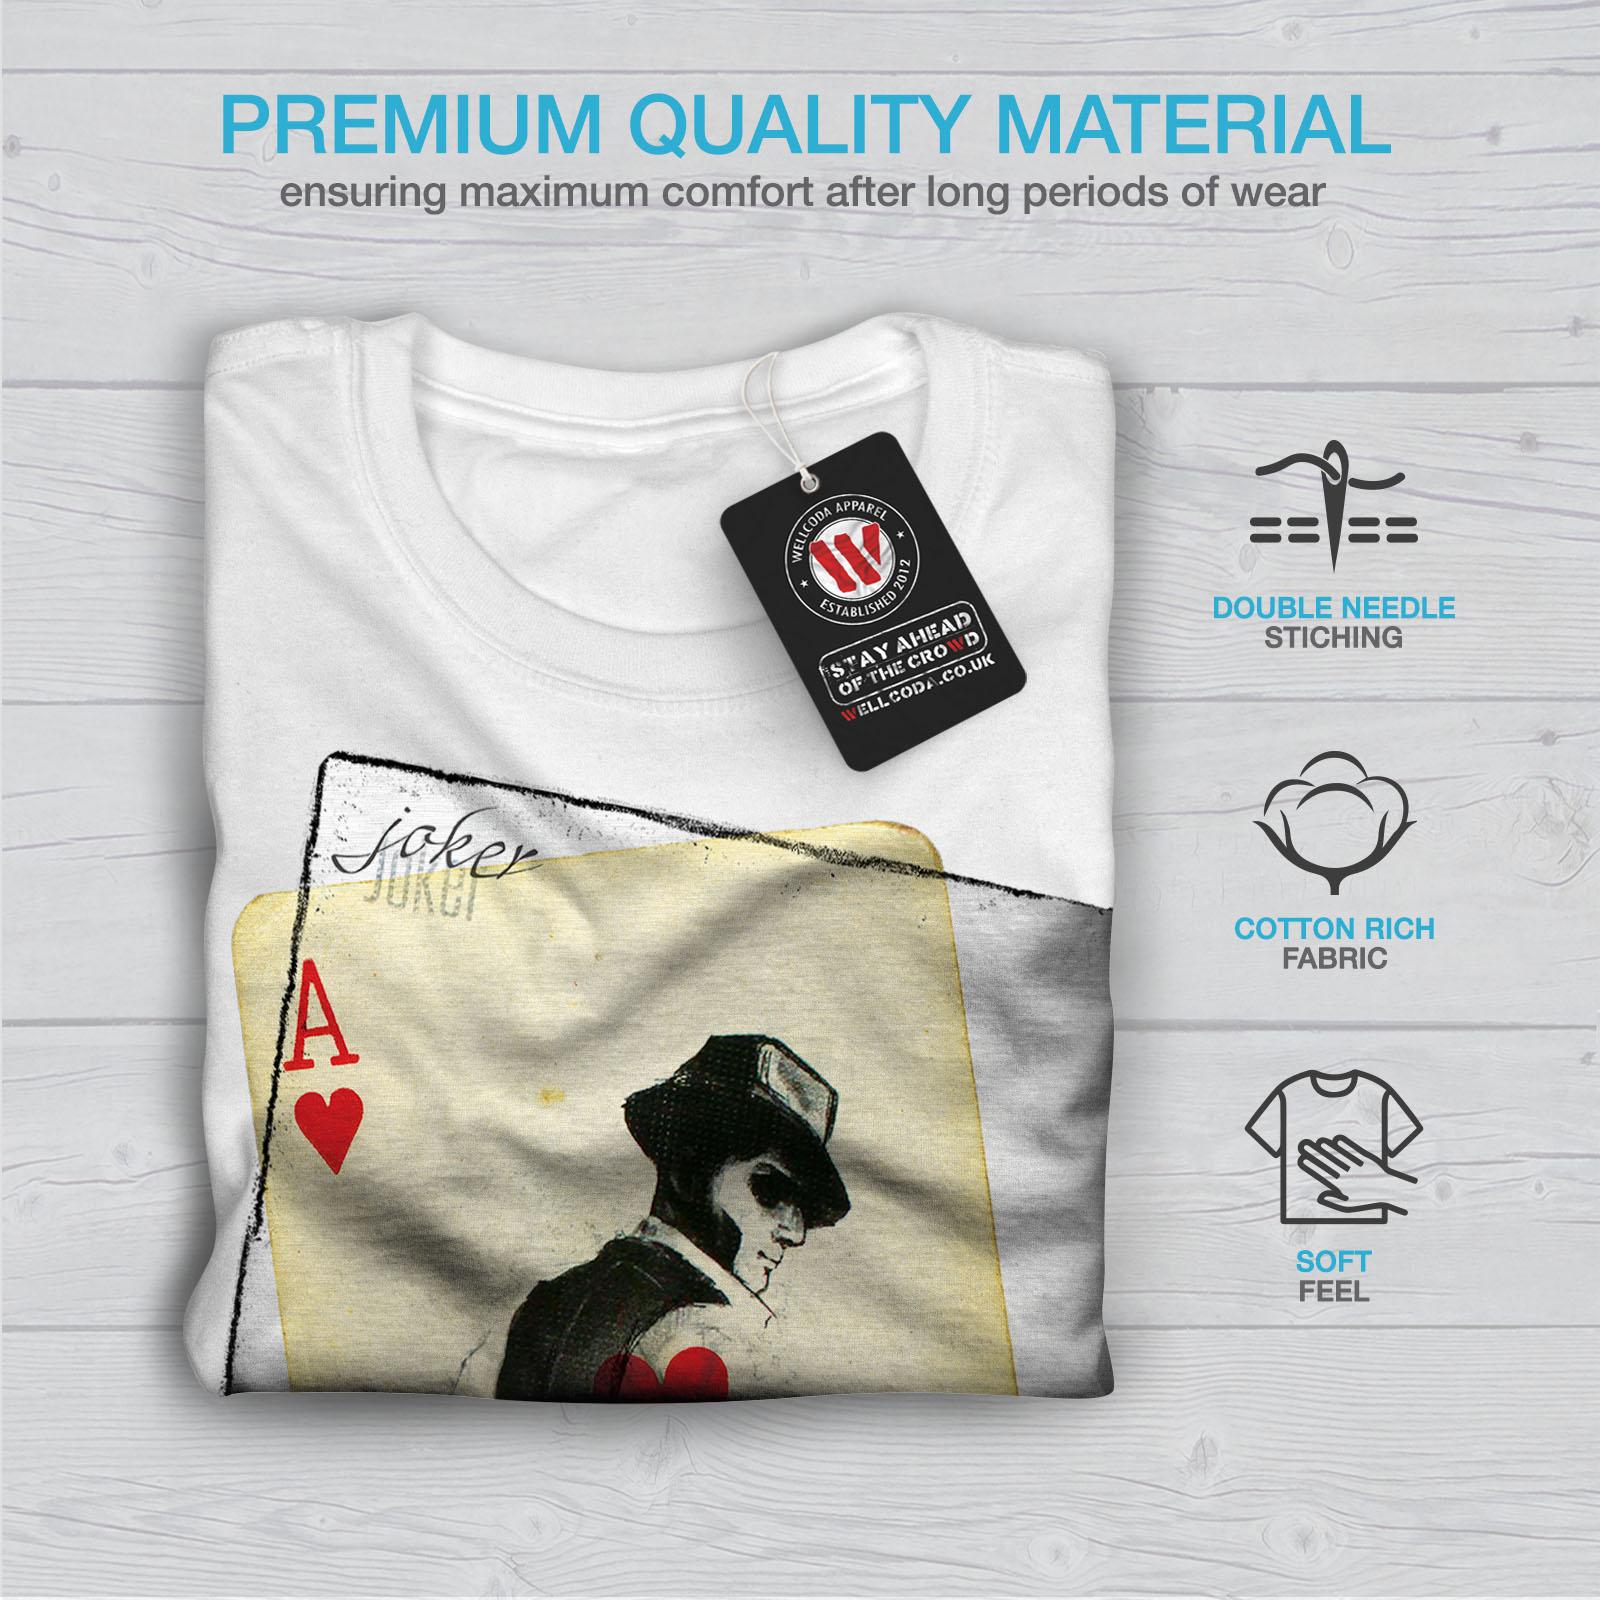 Wellcoda-POKER-misterioso-Da-Uomo-T-shirt-Gamble-design-grafico-stampato-T-shirt miniatura 13